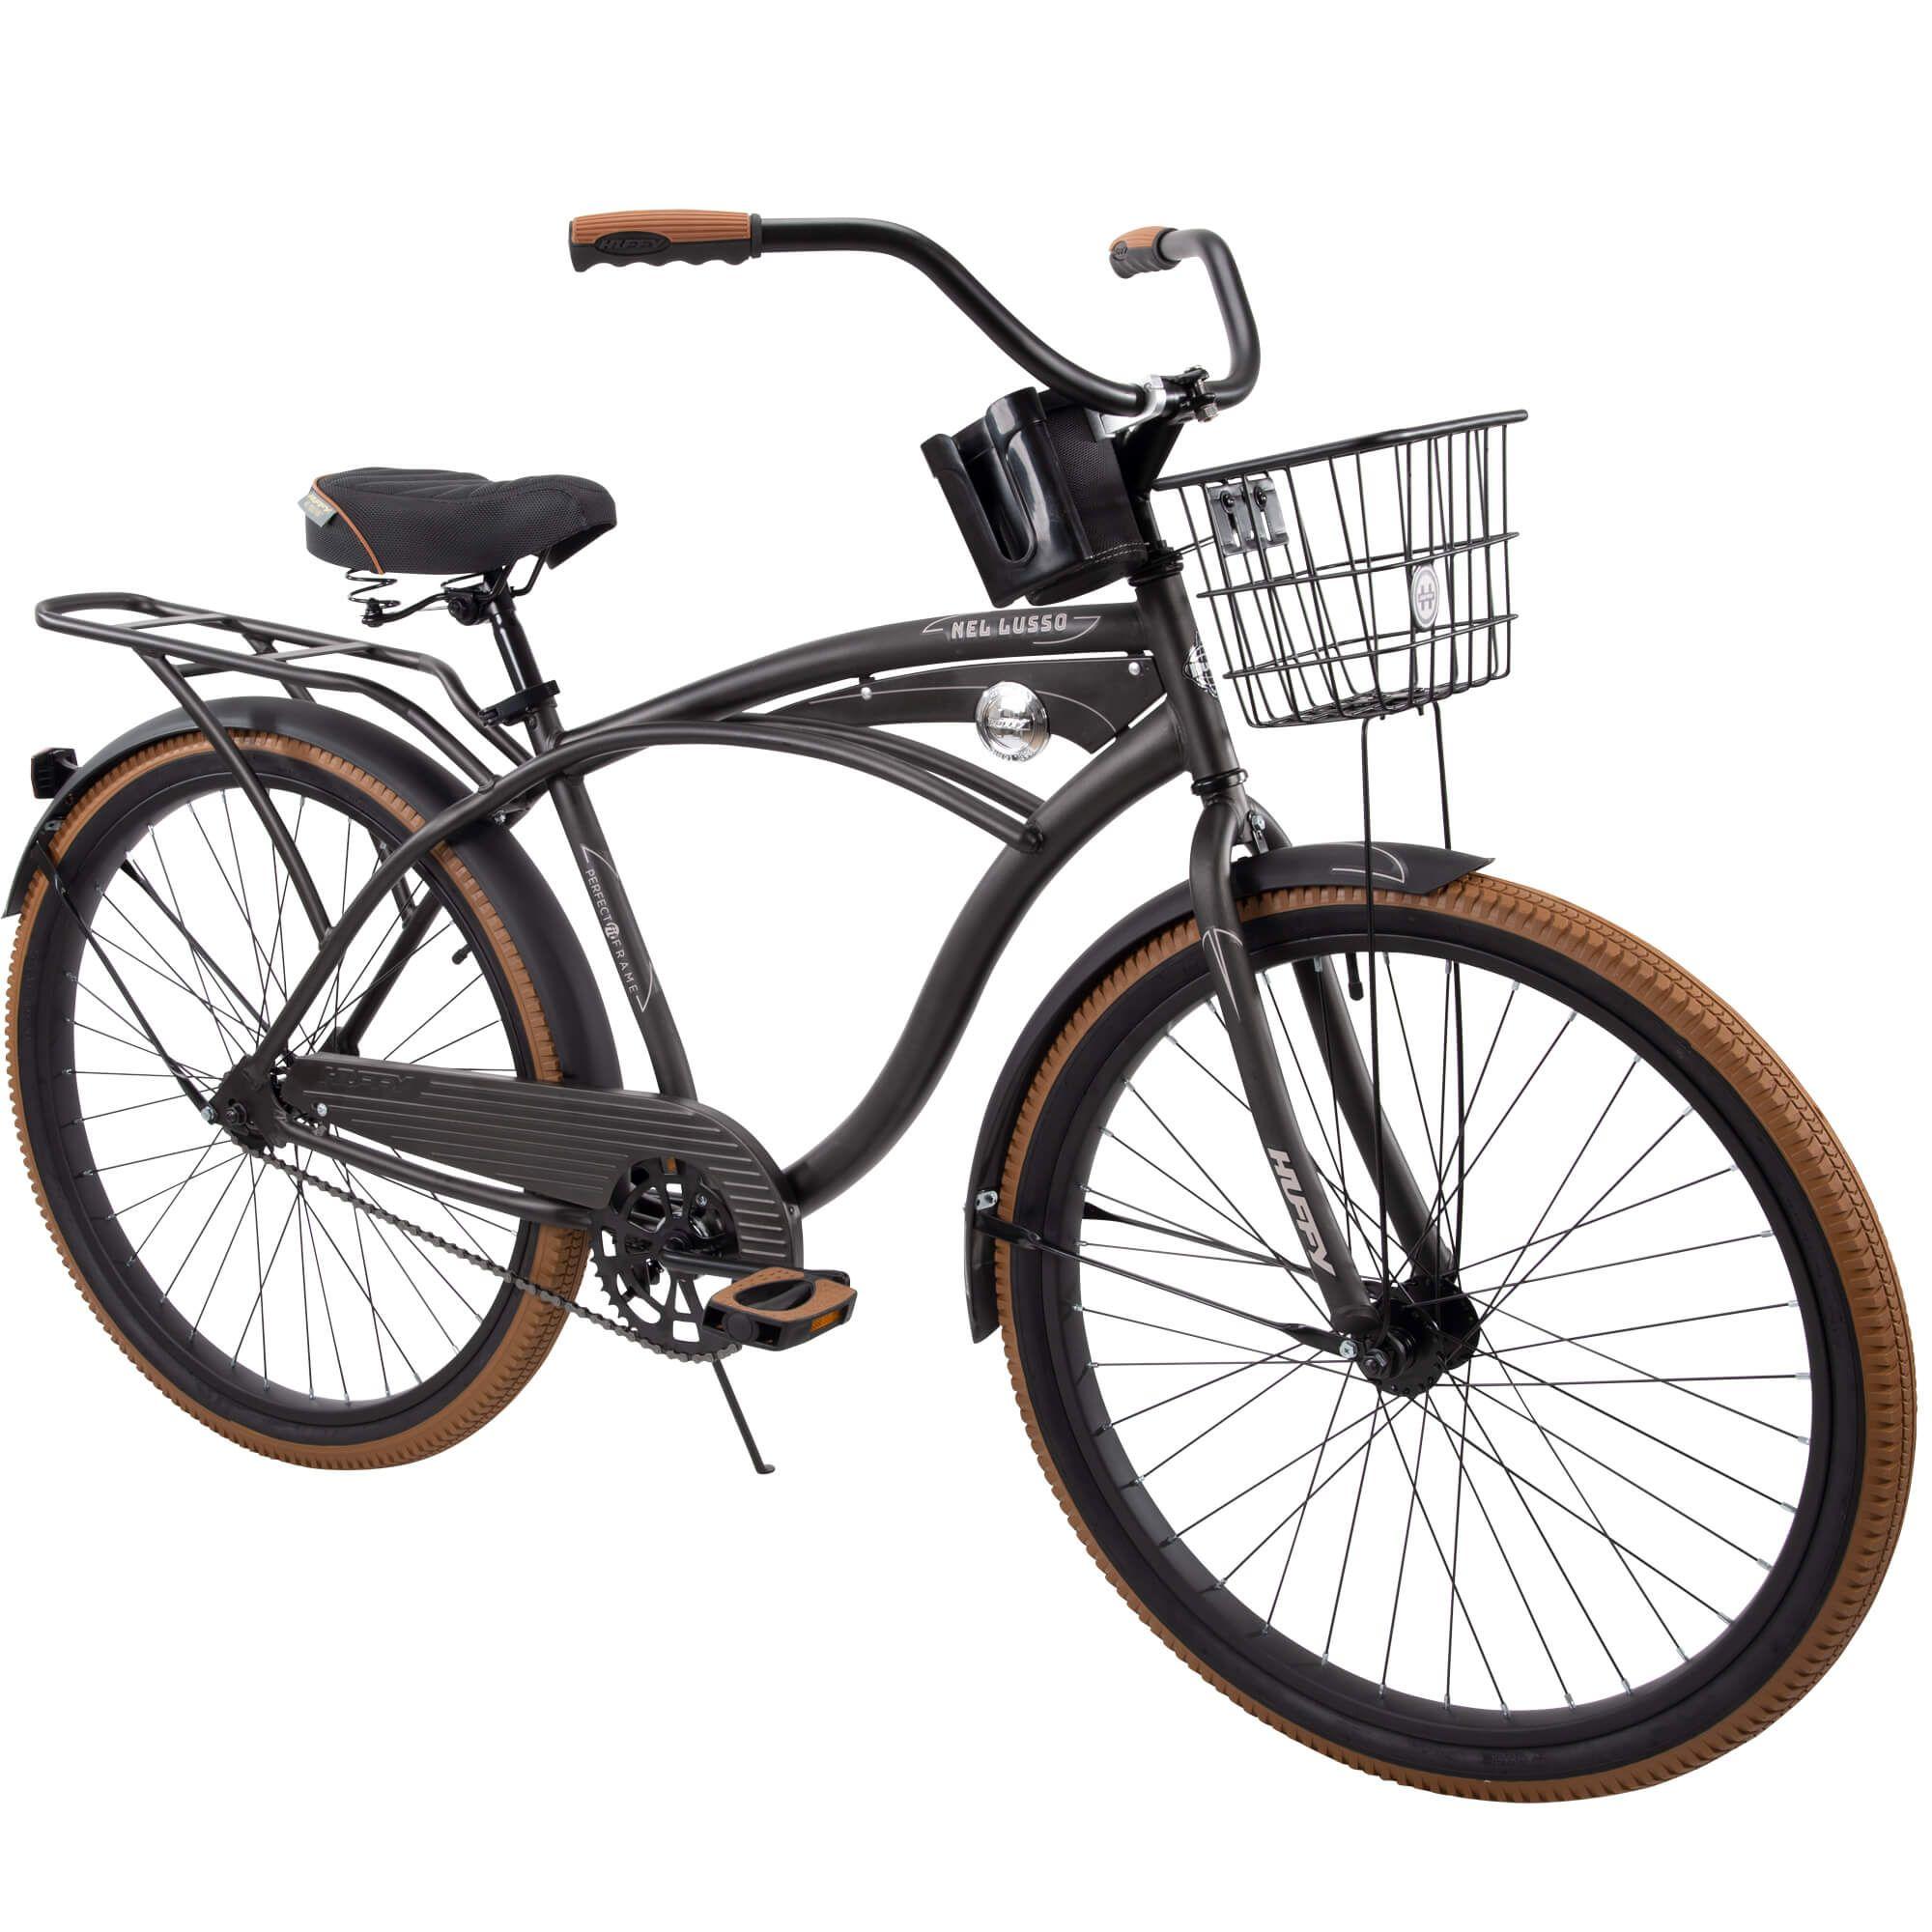 Huffy 26 Nel Lusso Men S Single Speed Comfort Cruiser Bike Charcoal Walmart Com In 2020 Cruiser Bike Cruiser Bike Black Beach Bicycle